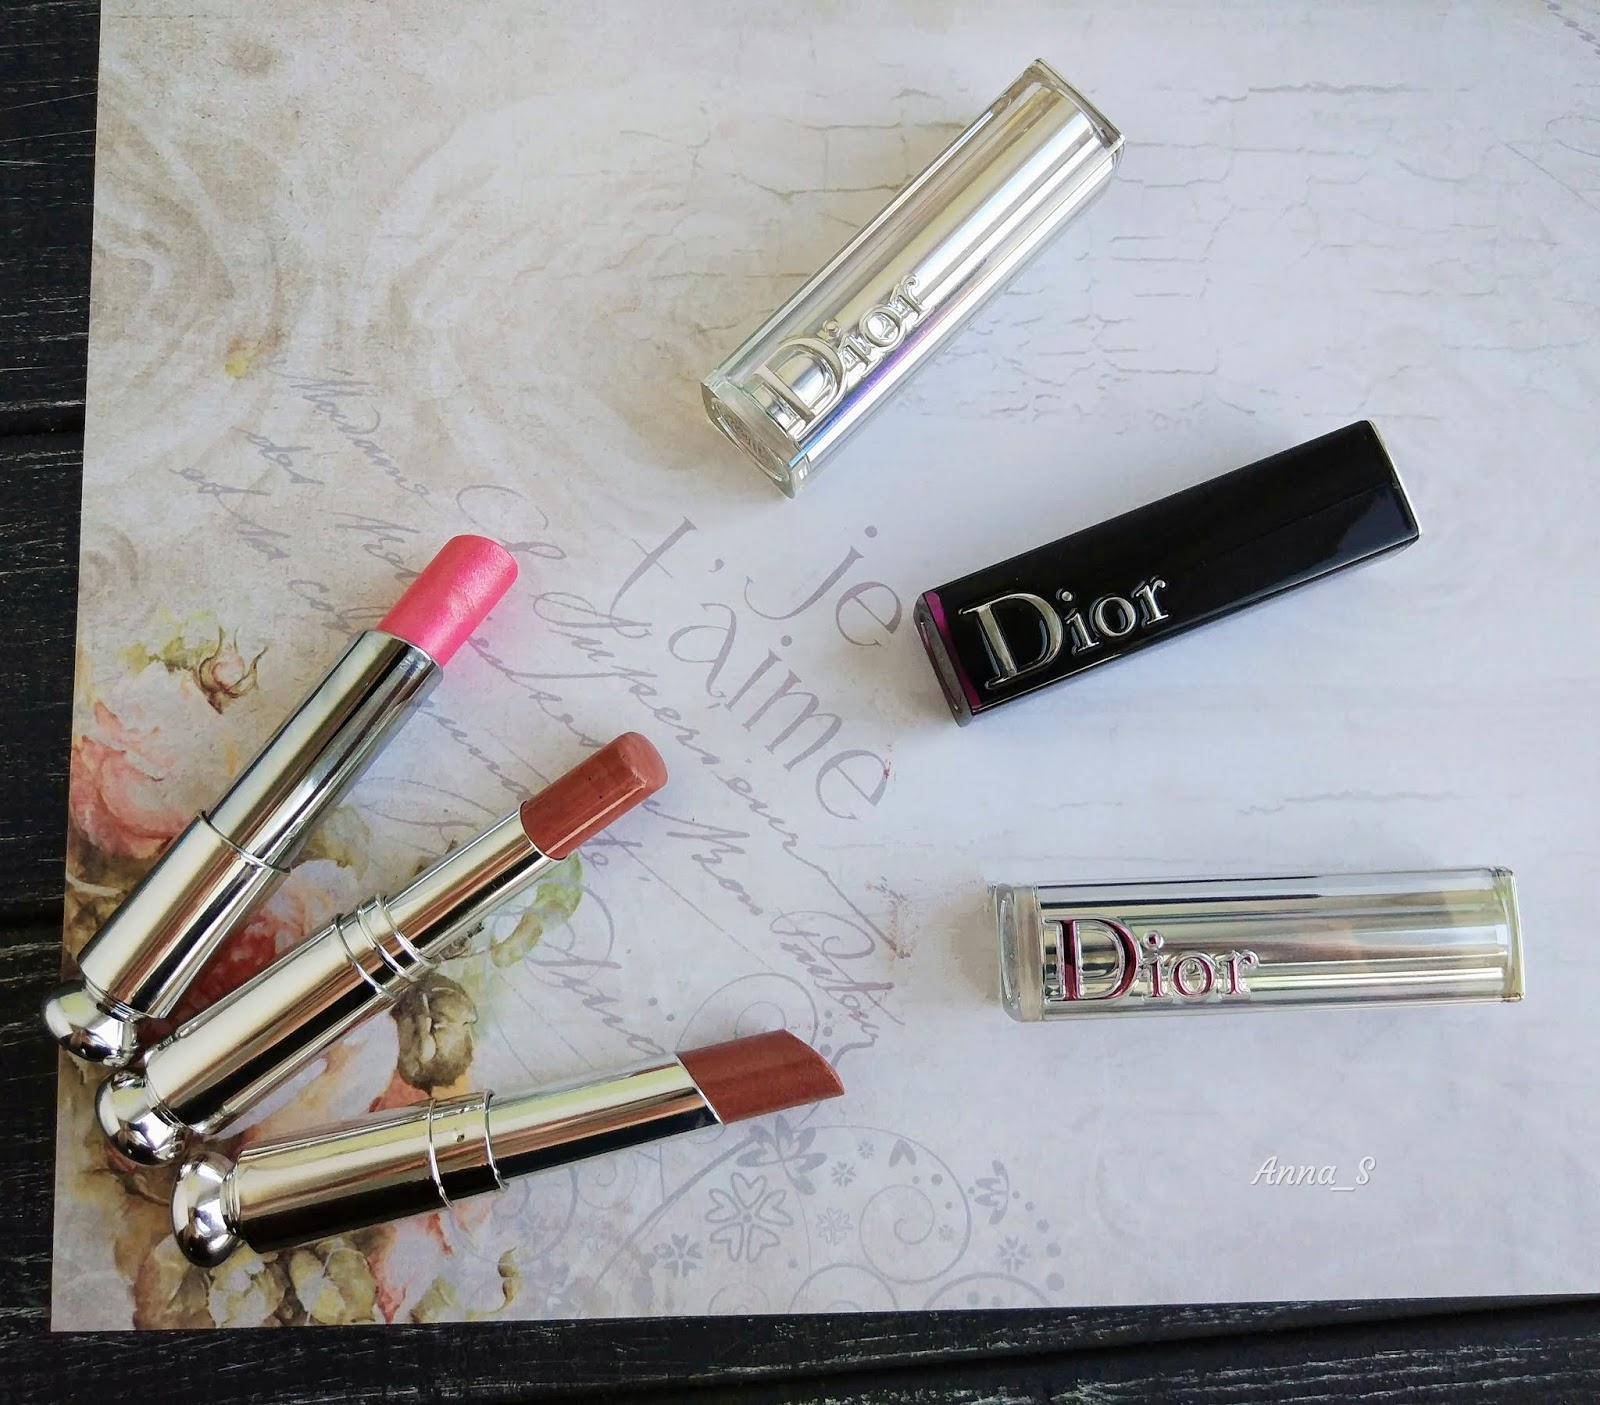 bd56b1f19a Beauty Stuff: Dior Addict Lipstick - три оттенка помад